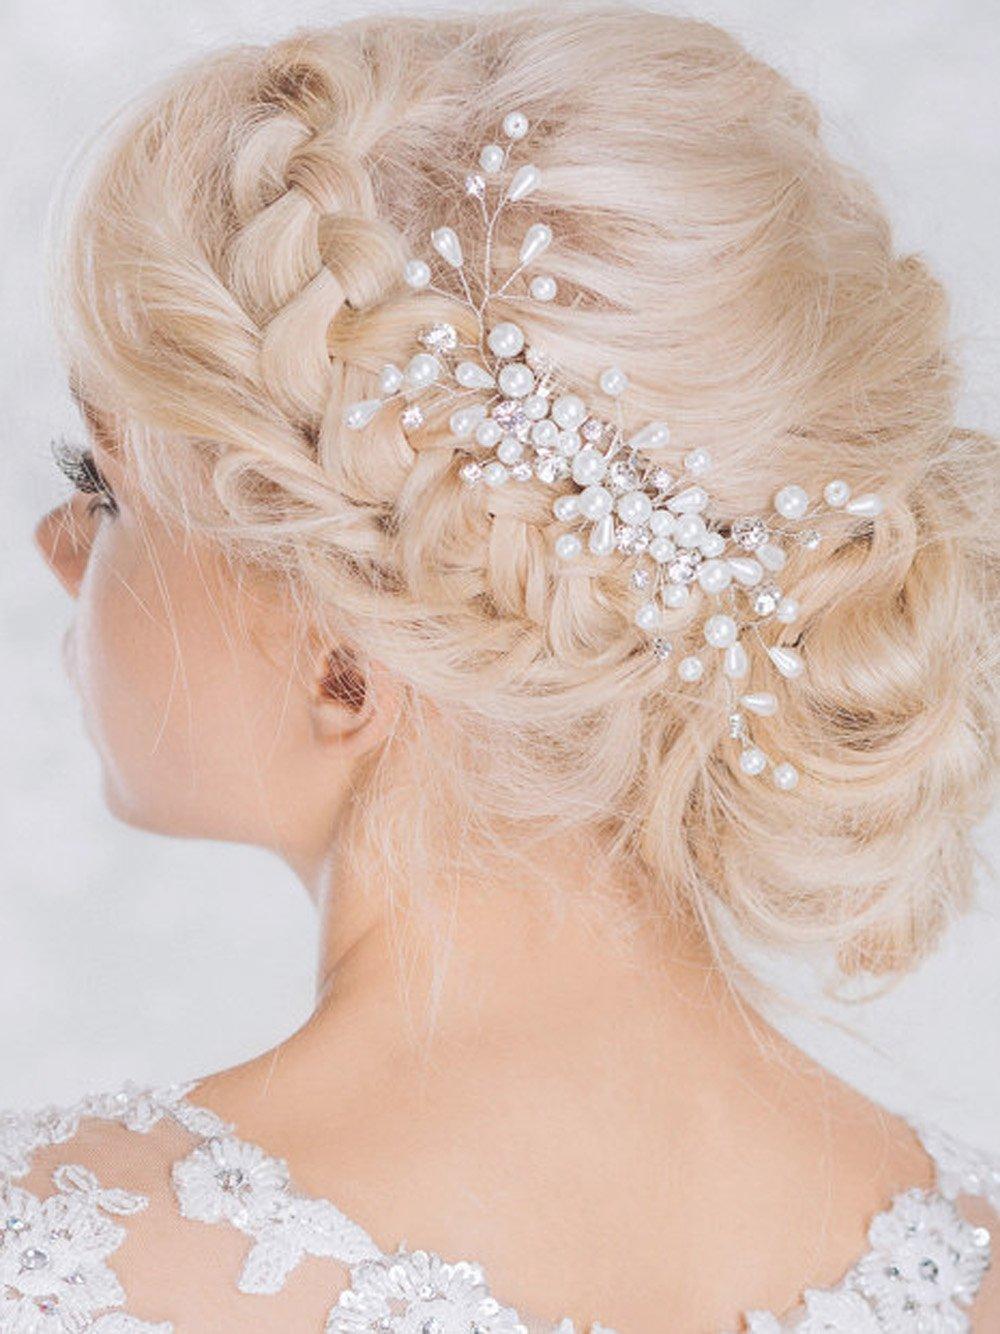 Yean Wedding Hair Combs, Bridal Hair Silver Comb for Bride and Bridesmaid